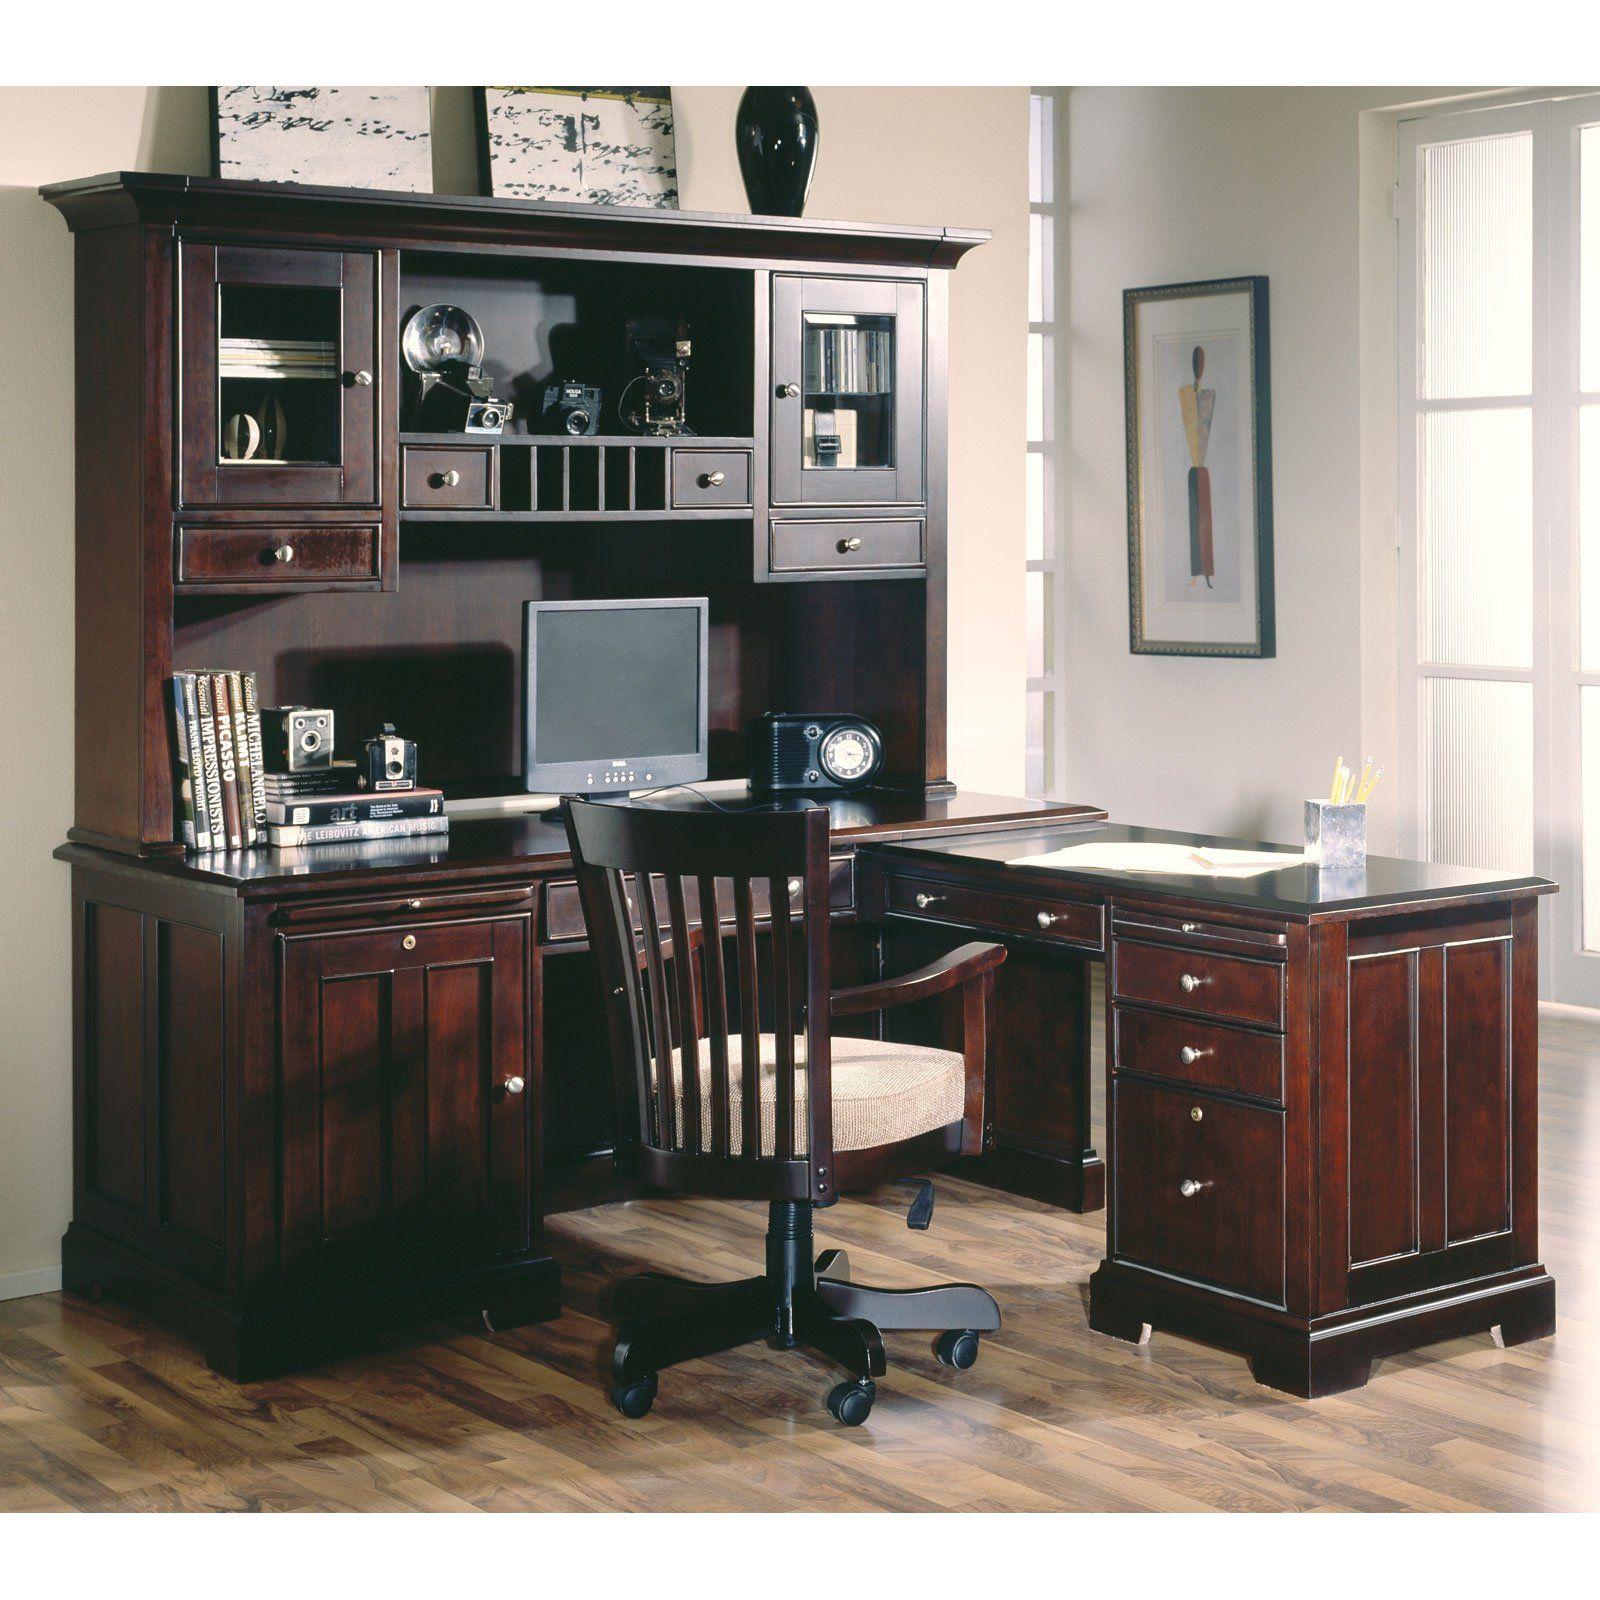 Riverside urban crossings l shaped desk with hutch espresso 2099 98